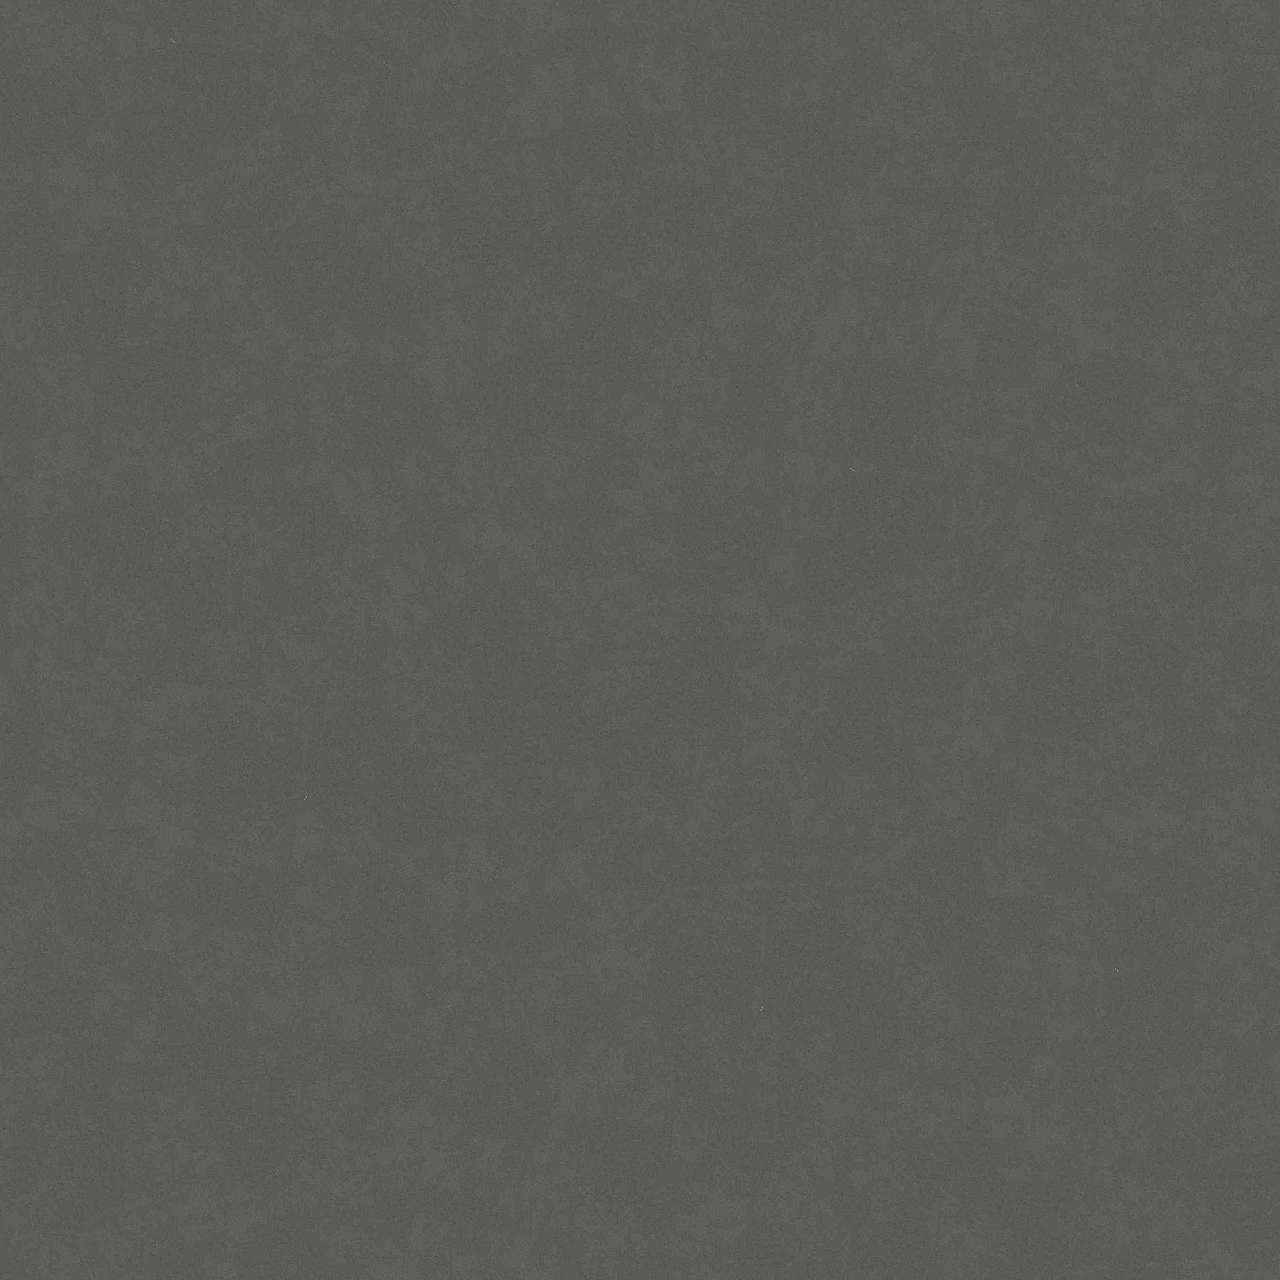 Искусственный камень, Кварц Silestone Cemeto Spa 20 мм